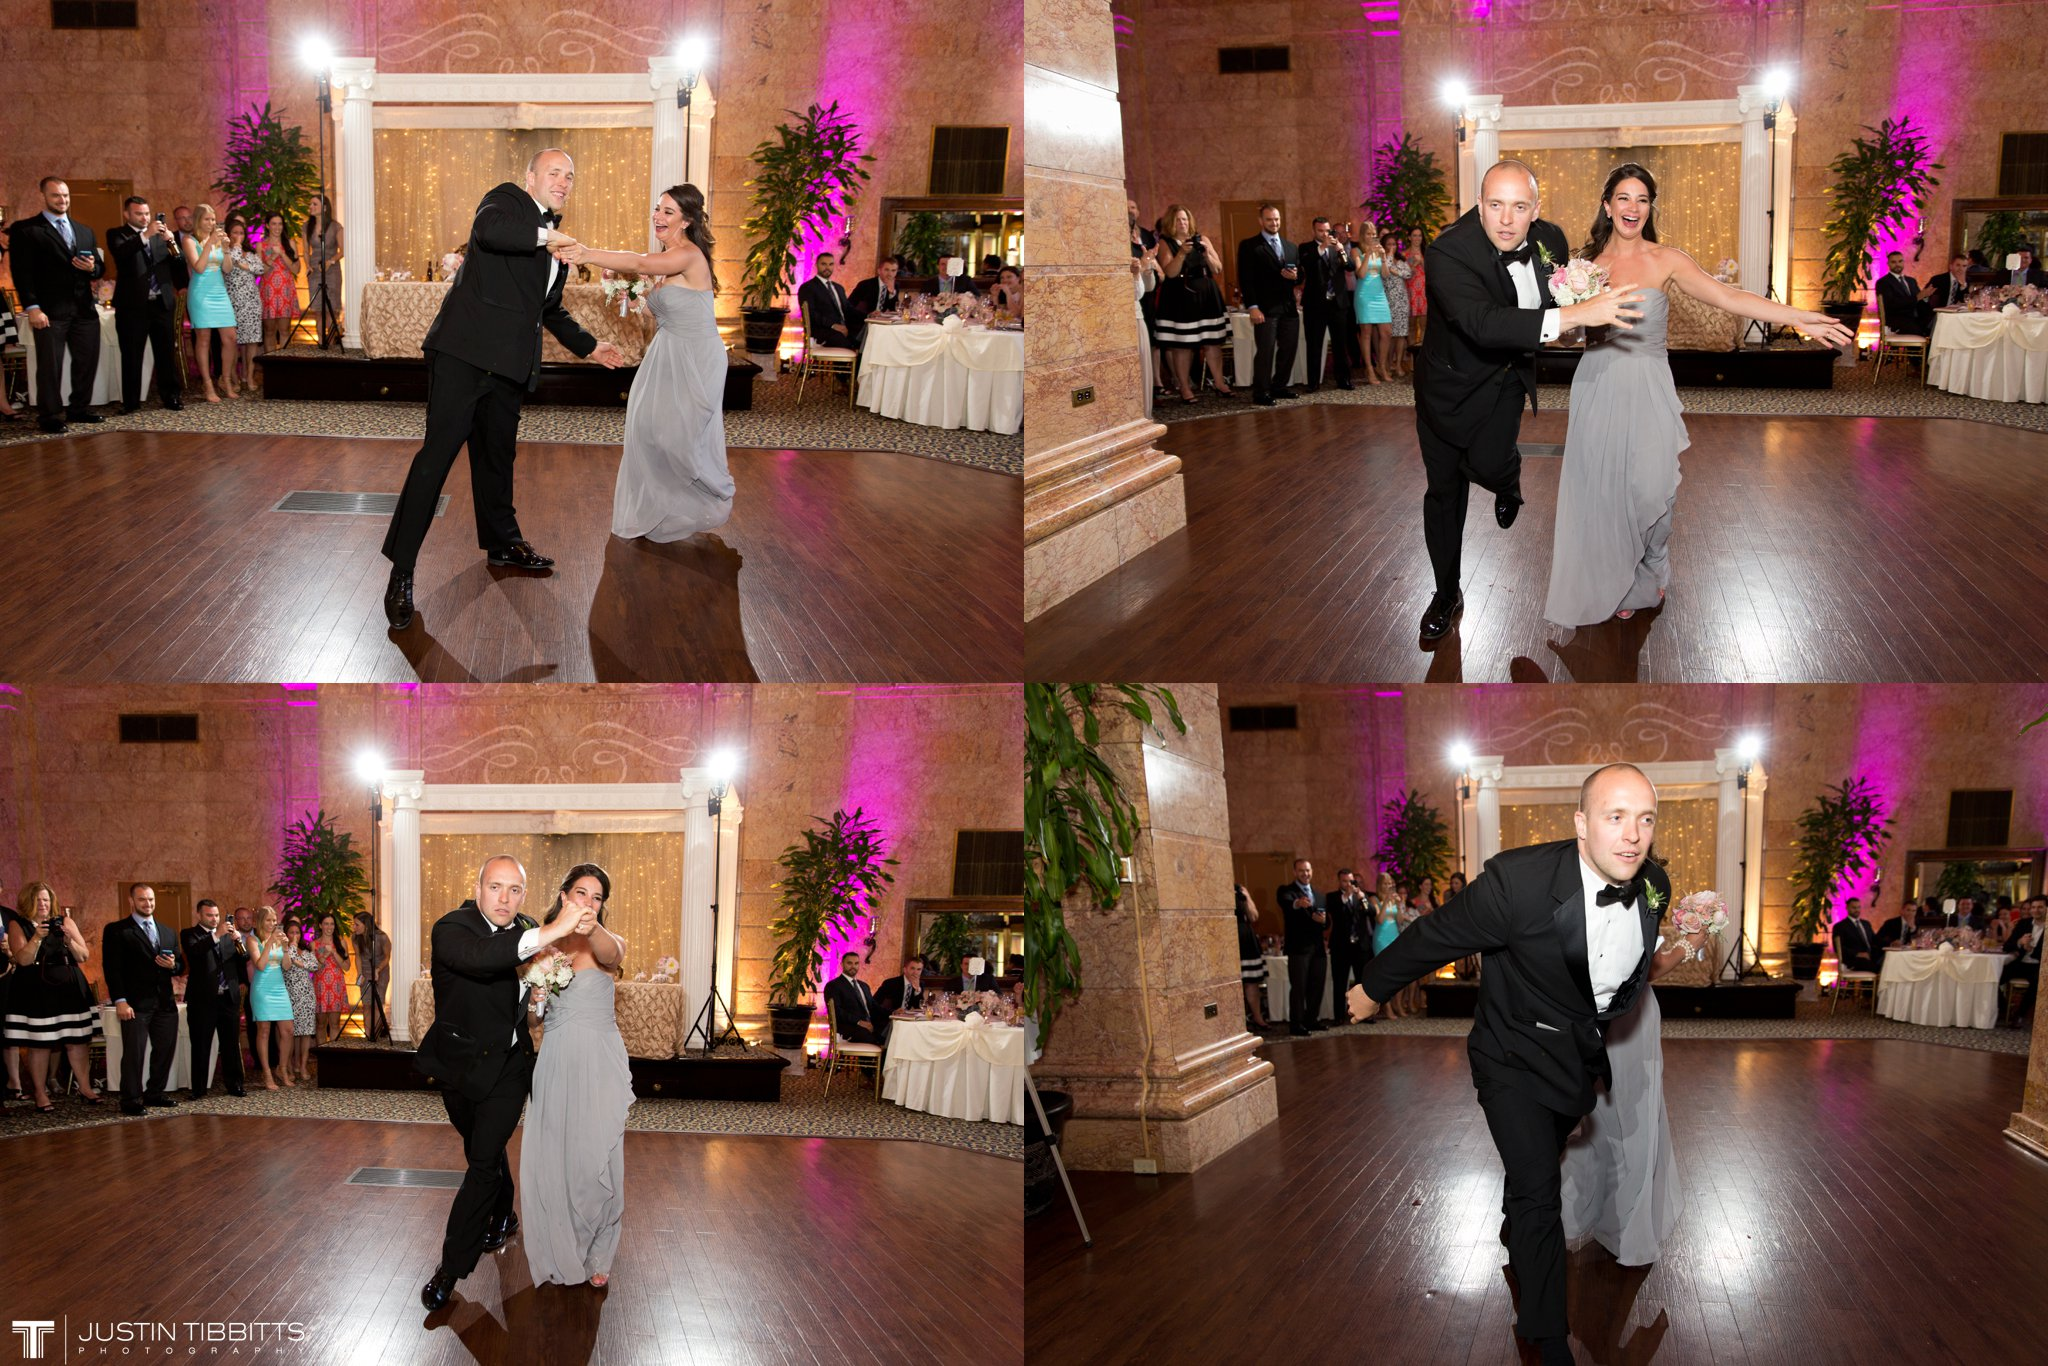 state-room-wedding-photos-with-amanda-and-nick_0146